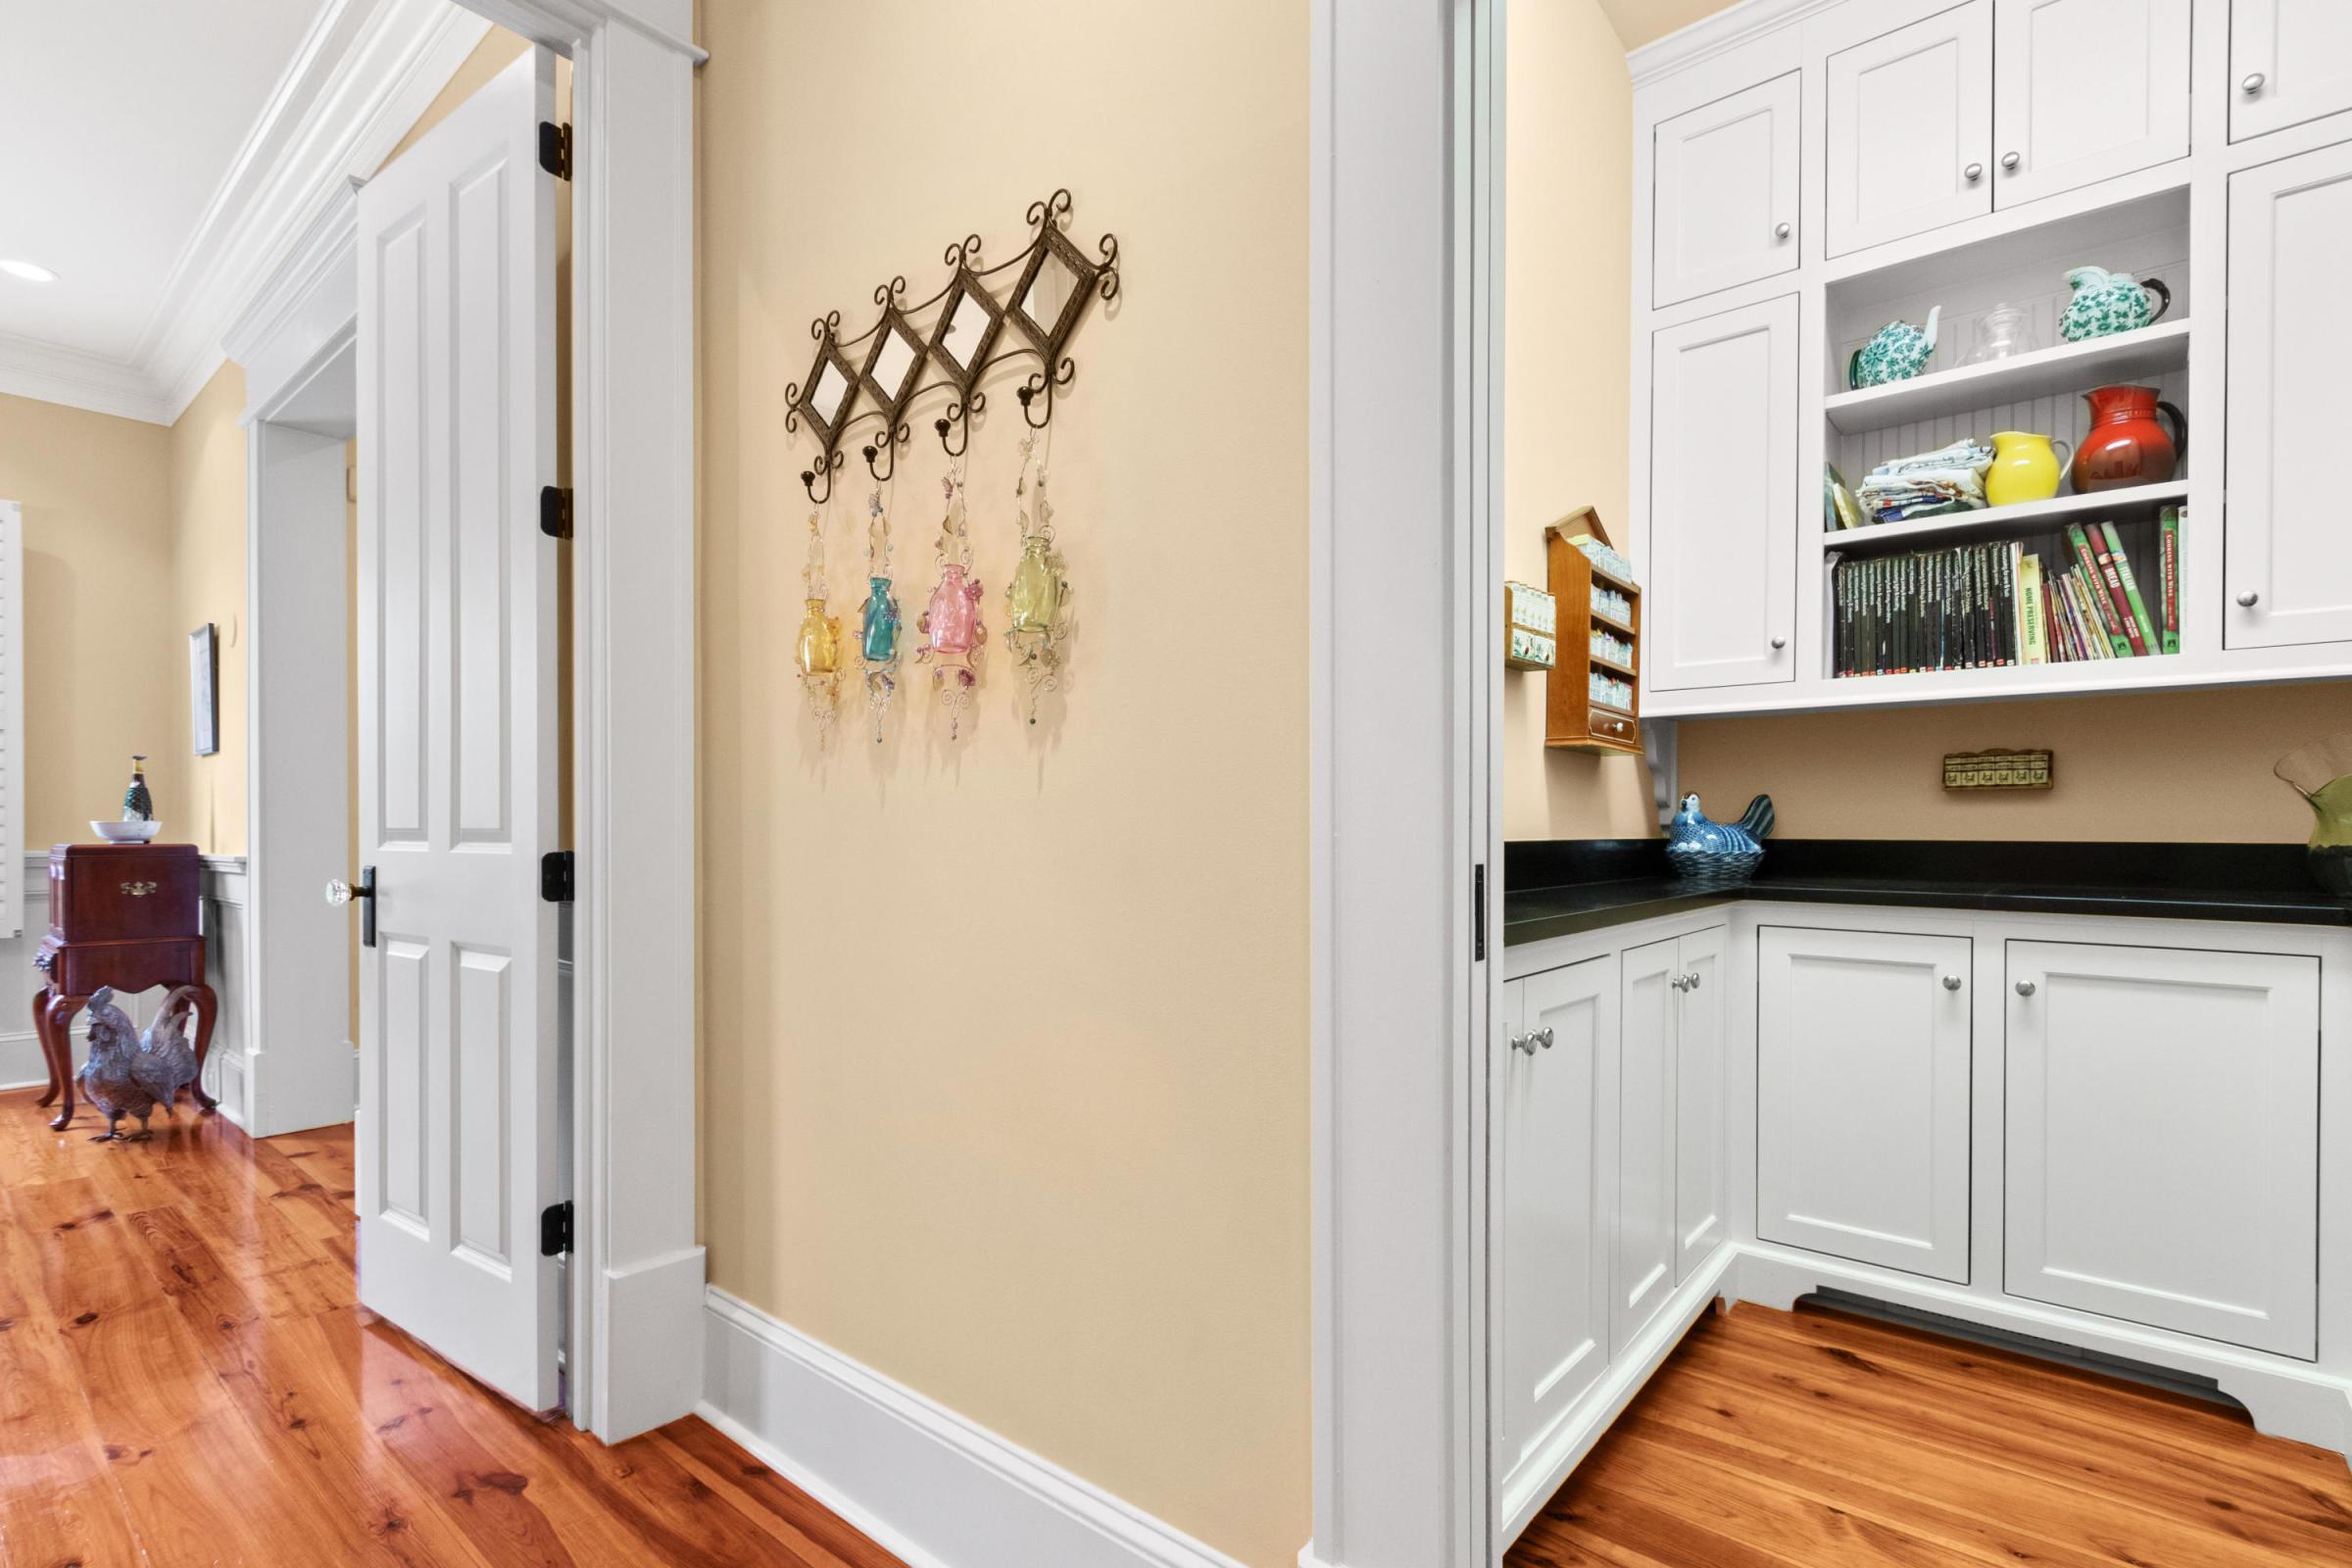 Broughton Hall Homes For Sale - 2058 Lakeshore, Pinopolis, SC - 10